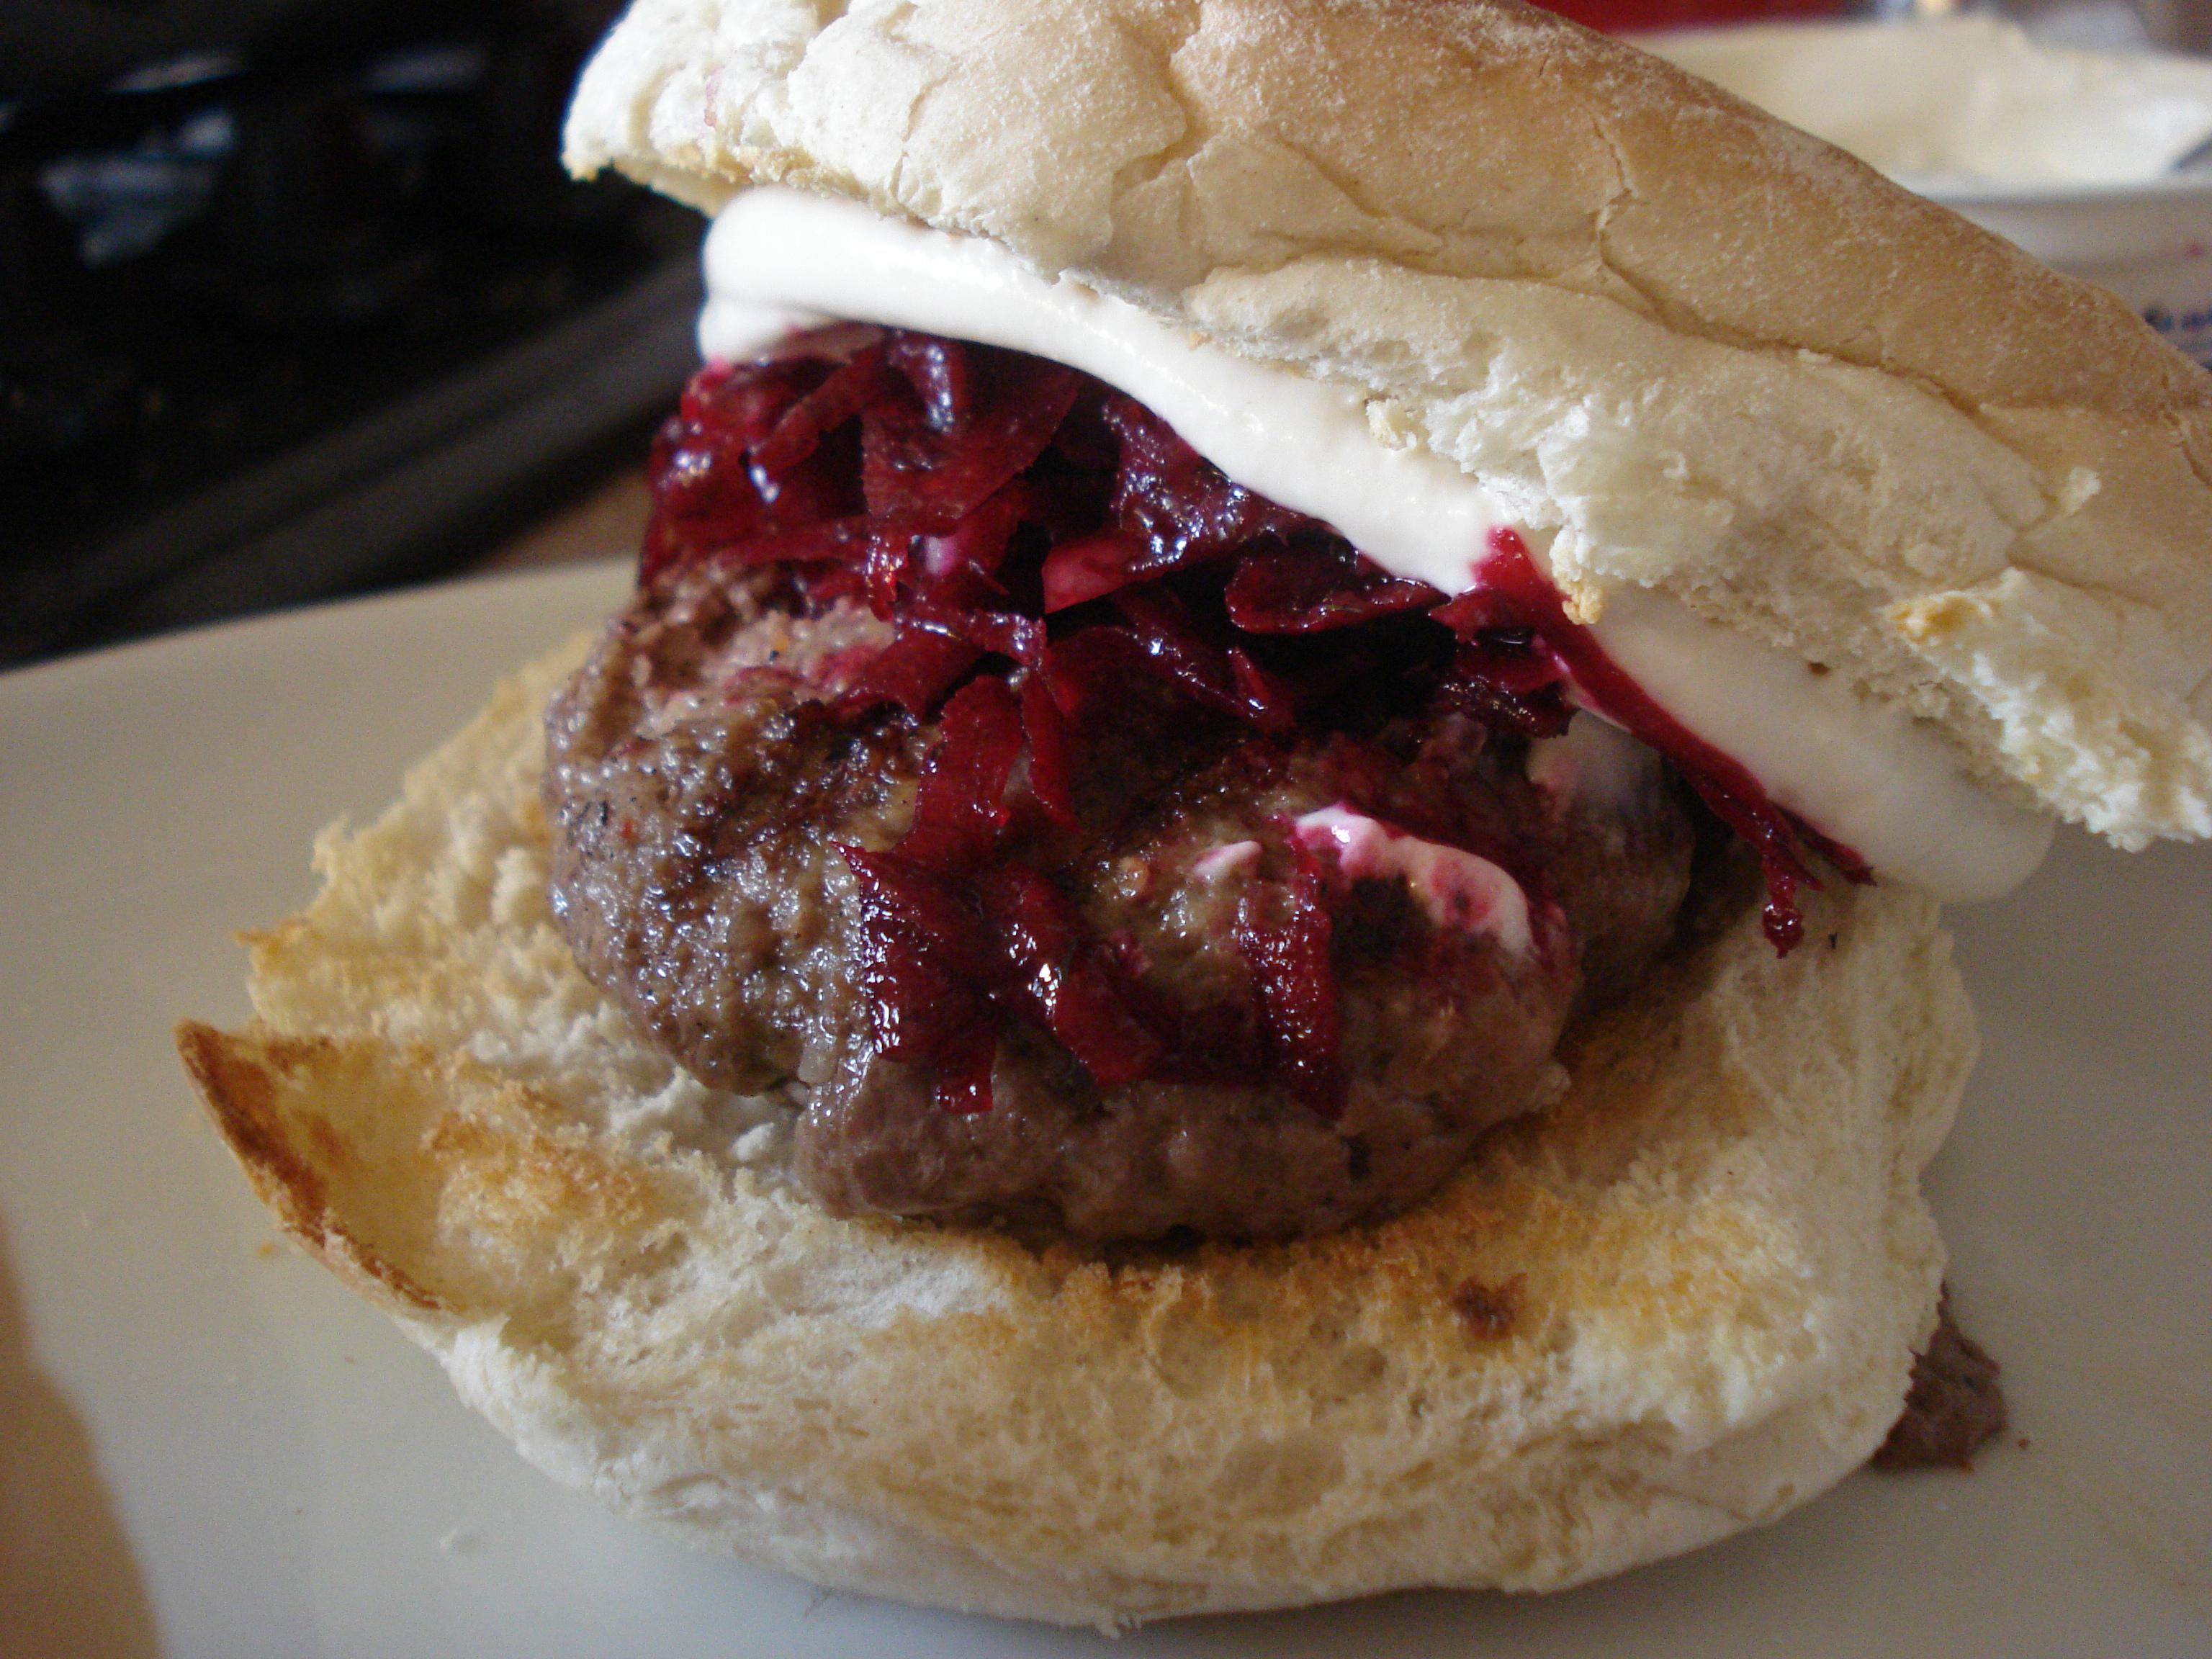 lamb burgers with beetroot relish and tahini yoghurt